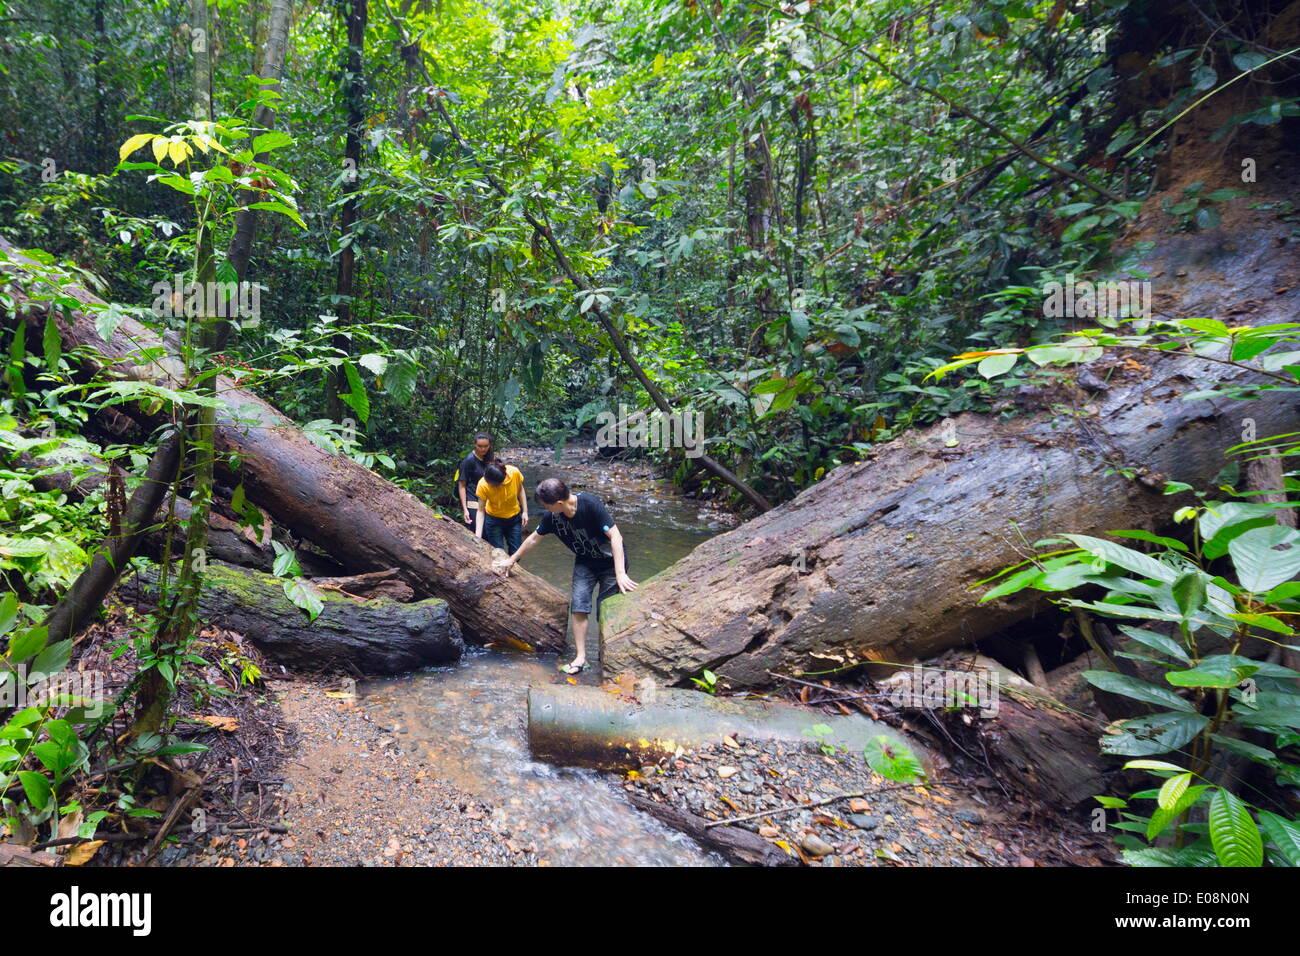 Ula Temburong National Park, Brunei, Borneo, Southeast Asia, Asia - Stock Image